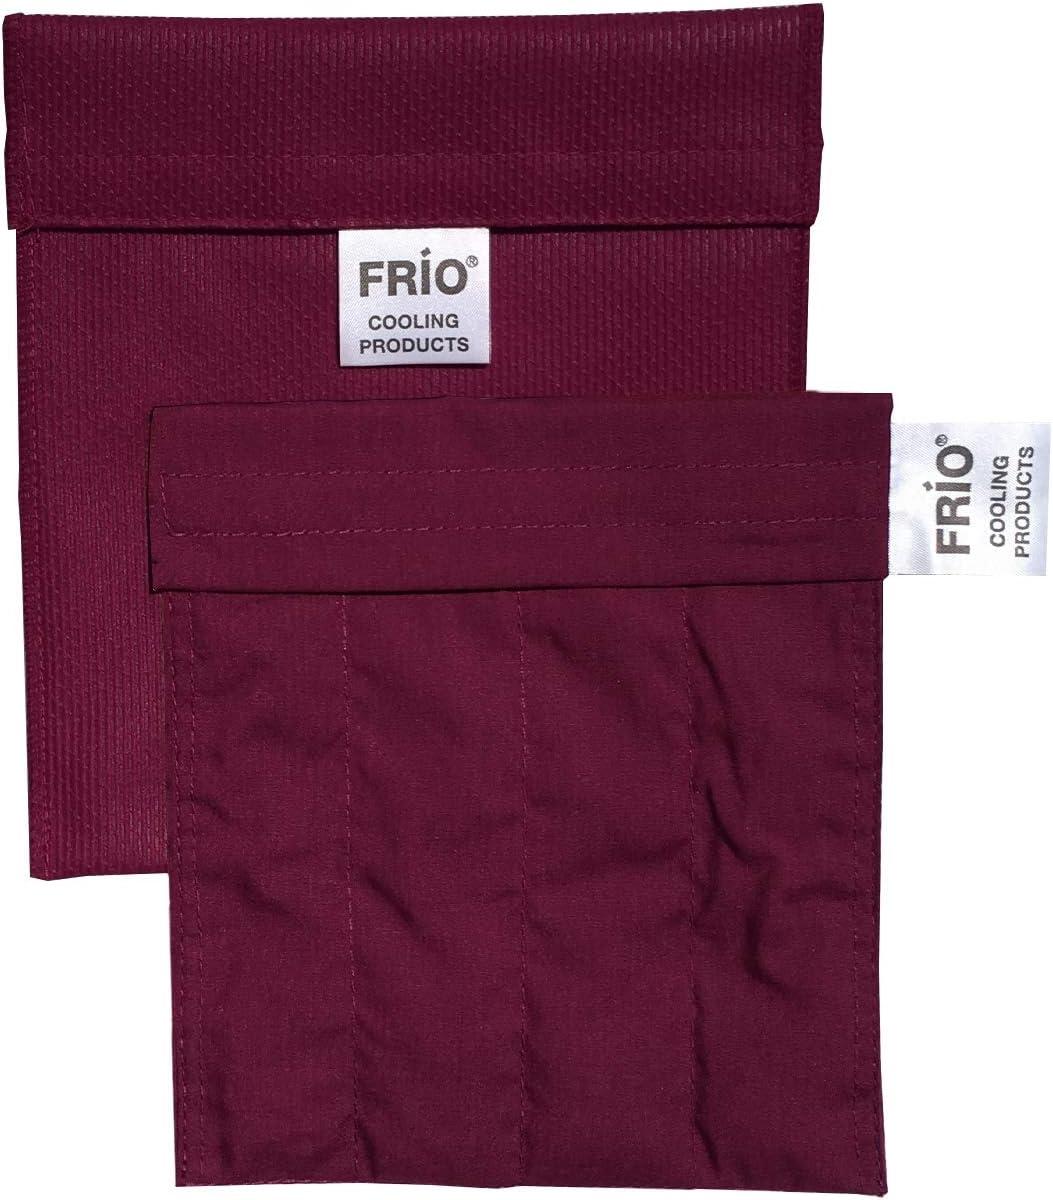 FRIO Insulin Pen Cooling Case, Reusable Evaporative Medication Cooler - Small Wallet, Burgundy